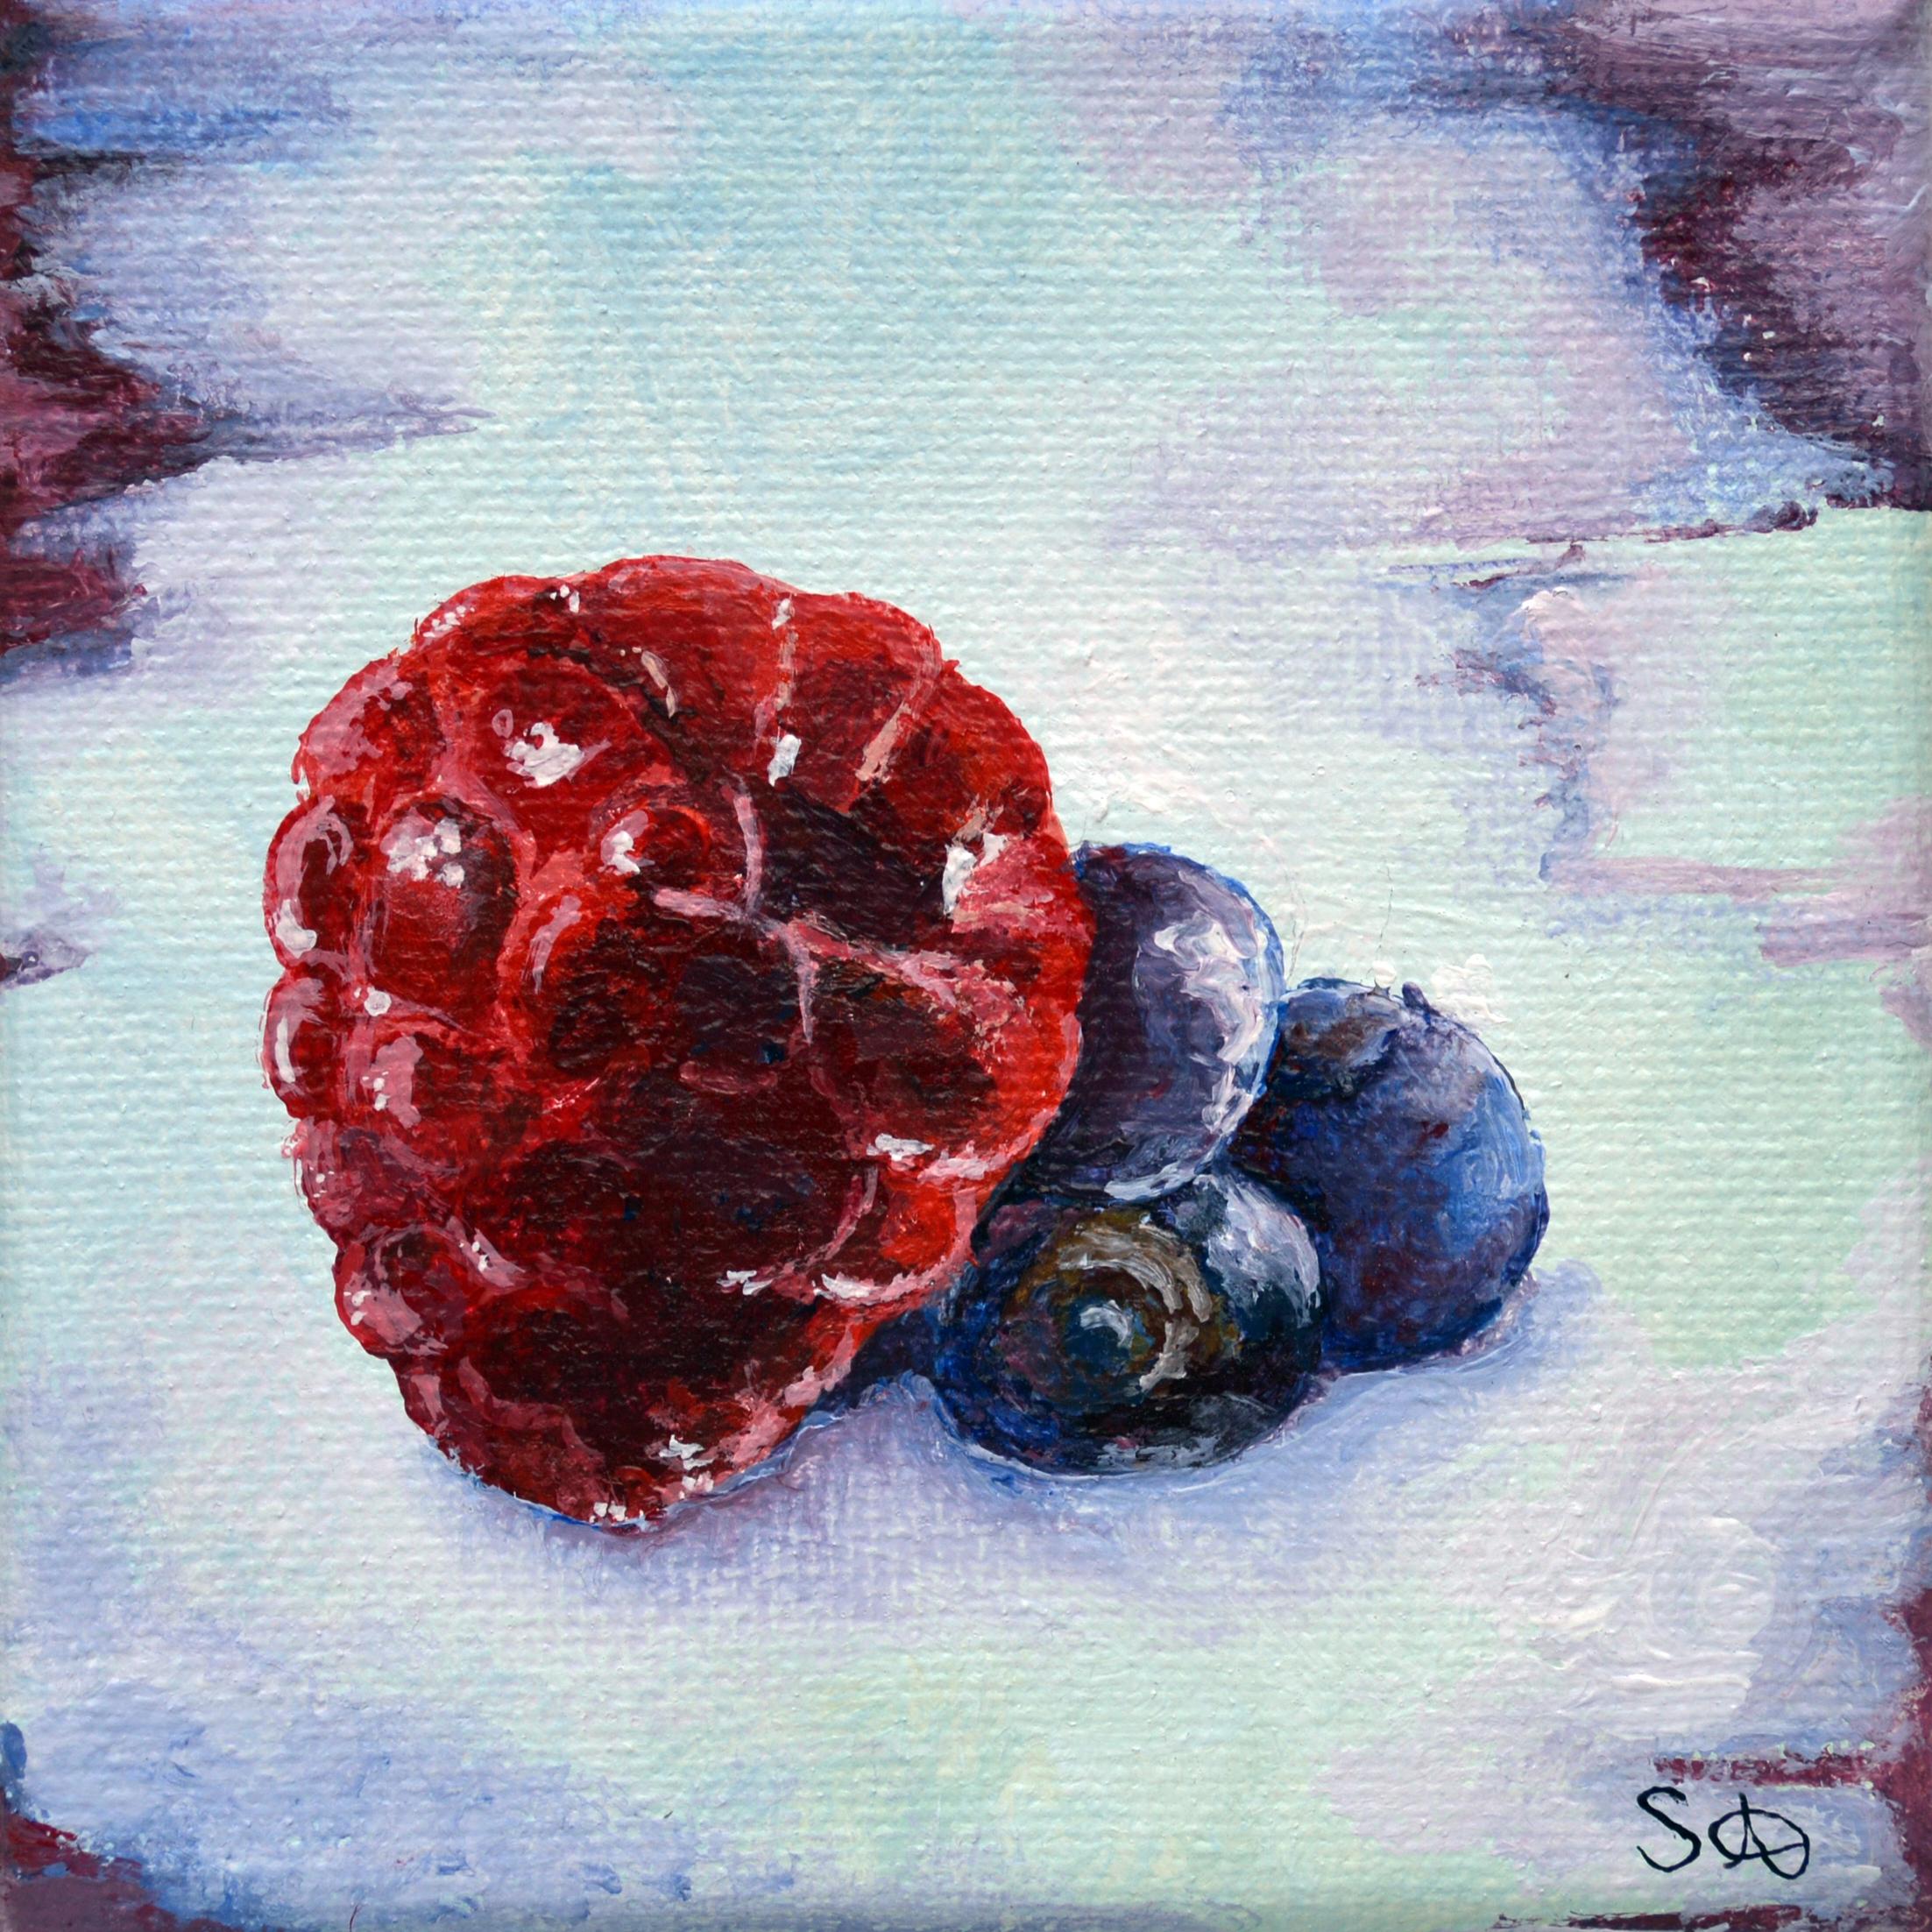 Summer Fruits: Raspberry & Blueberry